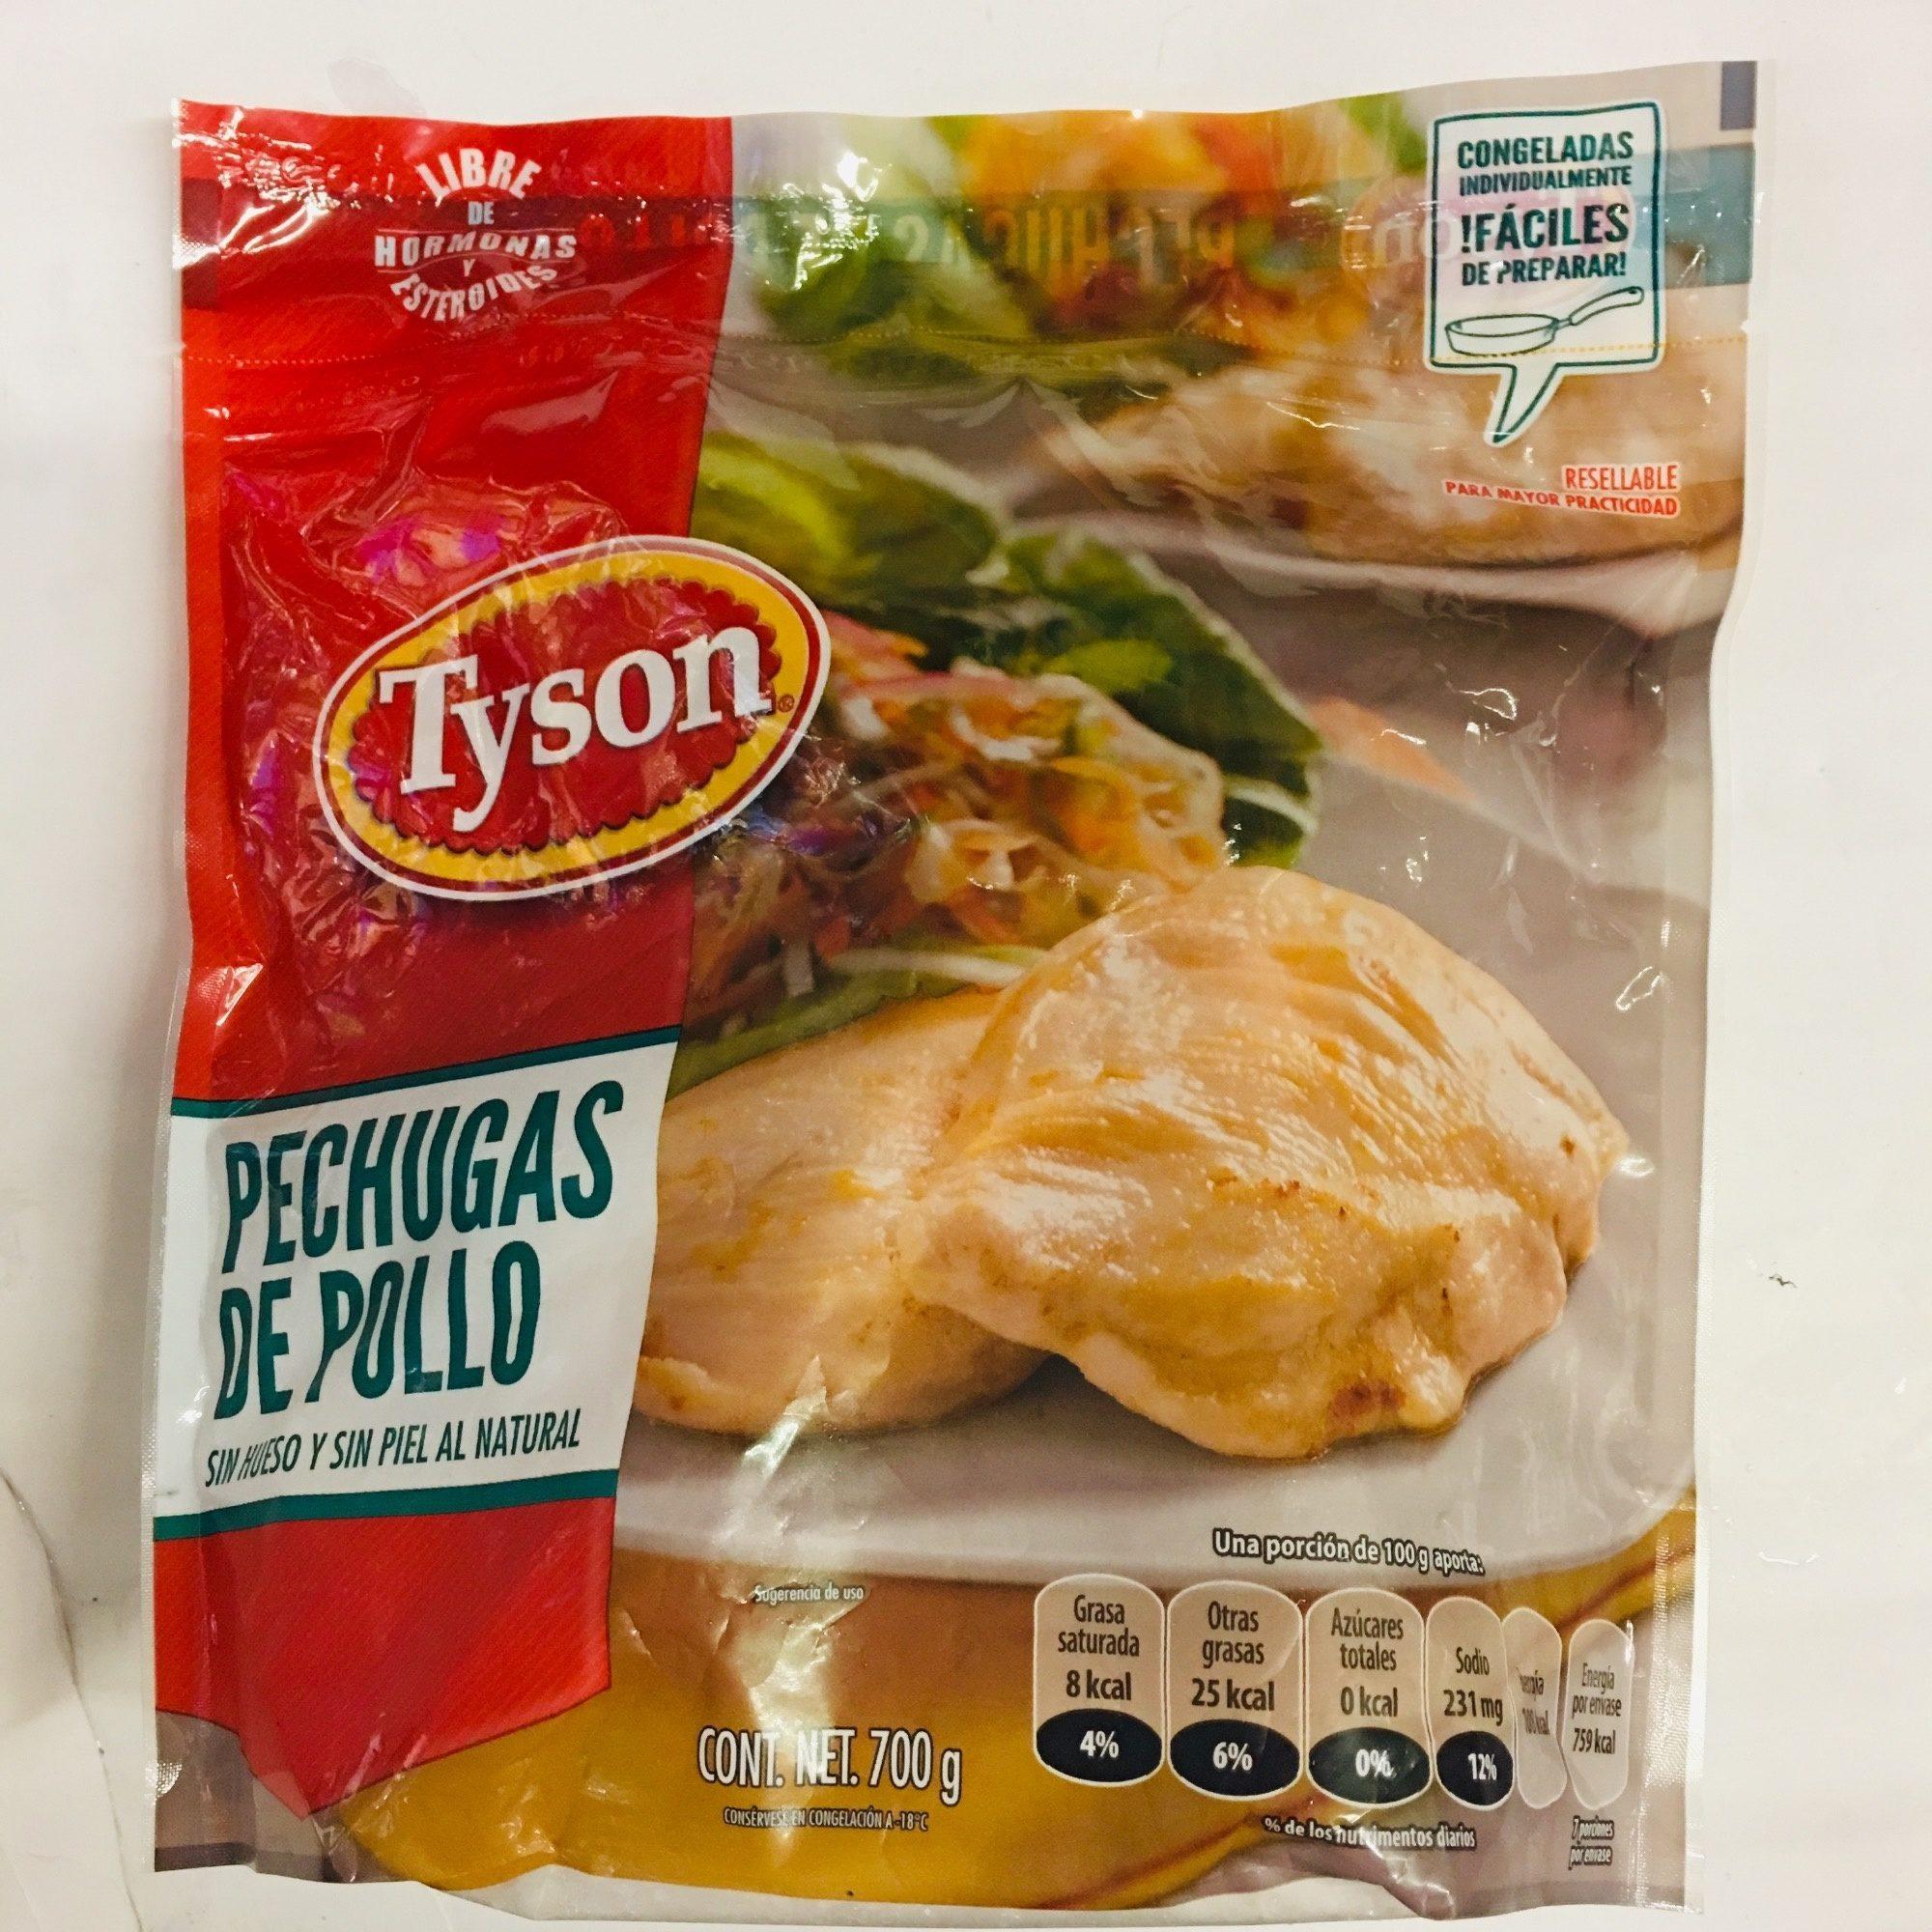 Pechugas de Pollo Tyson - Product - es